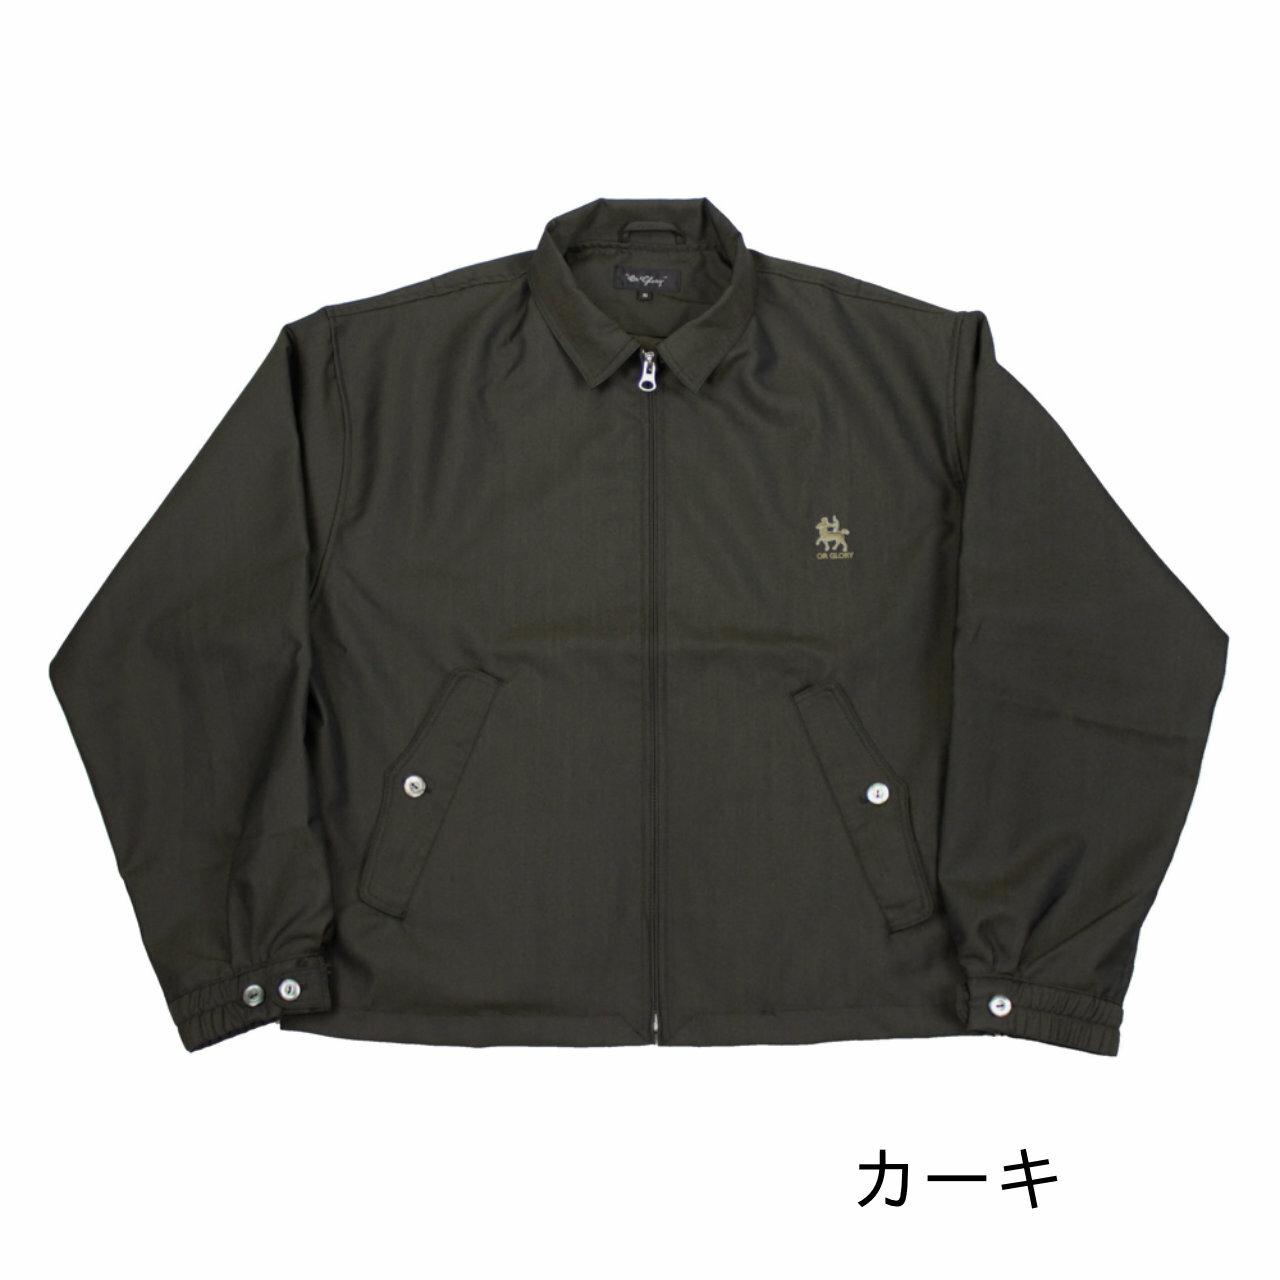 【Or Glory】 シャンブレー 50's ドリズラージャケット 〈Khaki〉